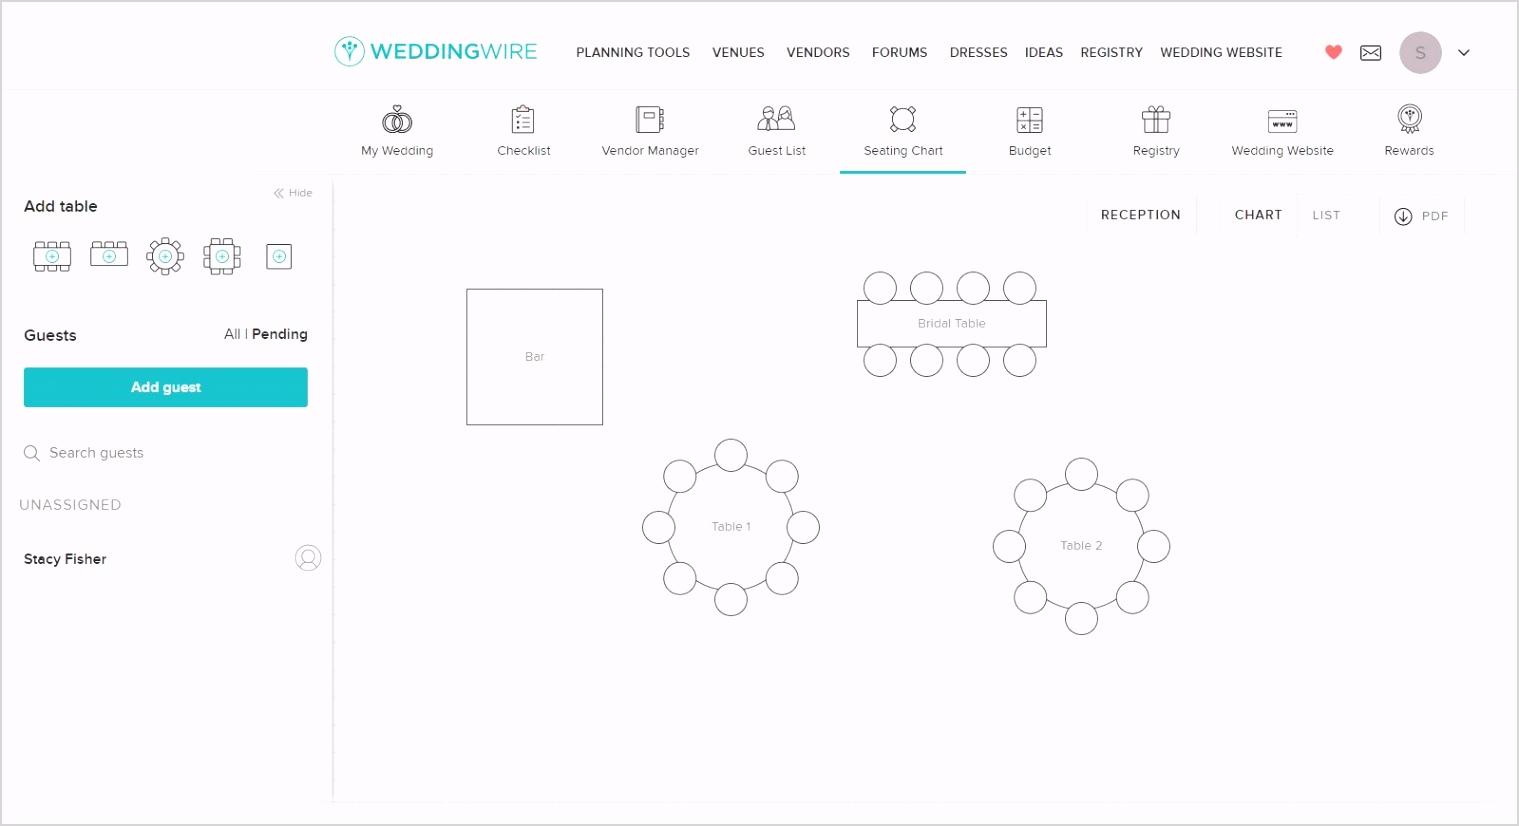 wedding wire seating chart 618a b9f eaedb8ca503d0a1